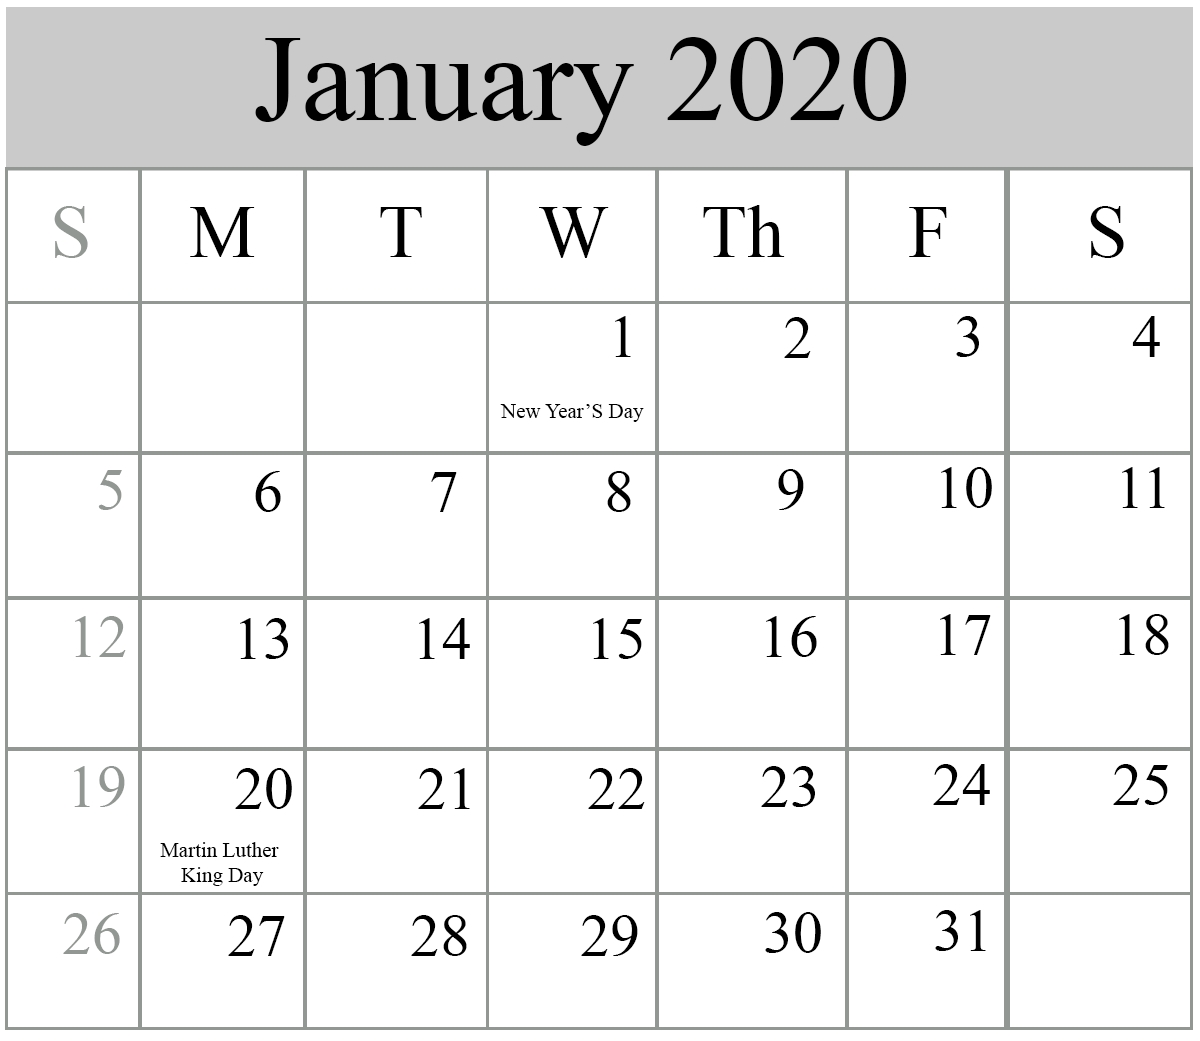 Free Blank January 2020 Calendar Printable In Pdf, Word-January 2020 Calendar In Excel